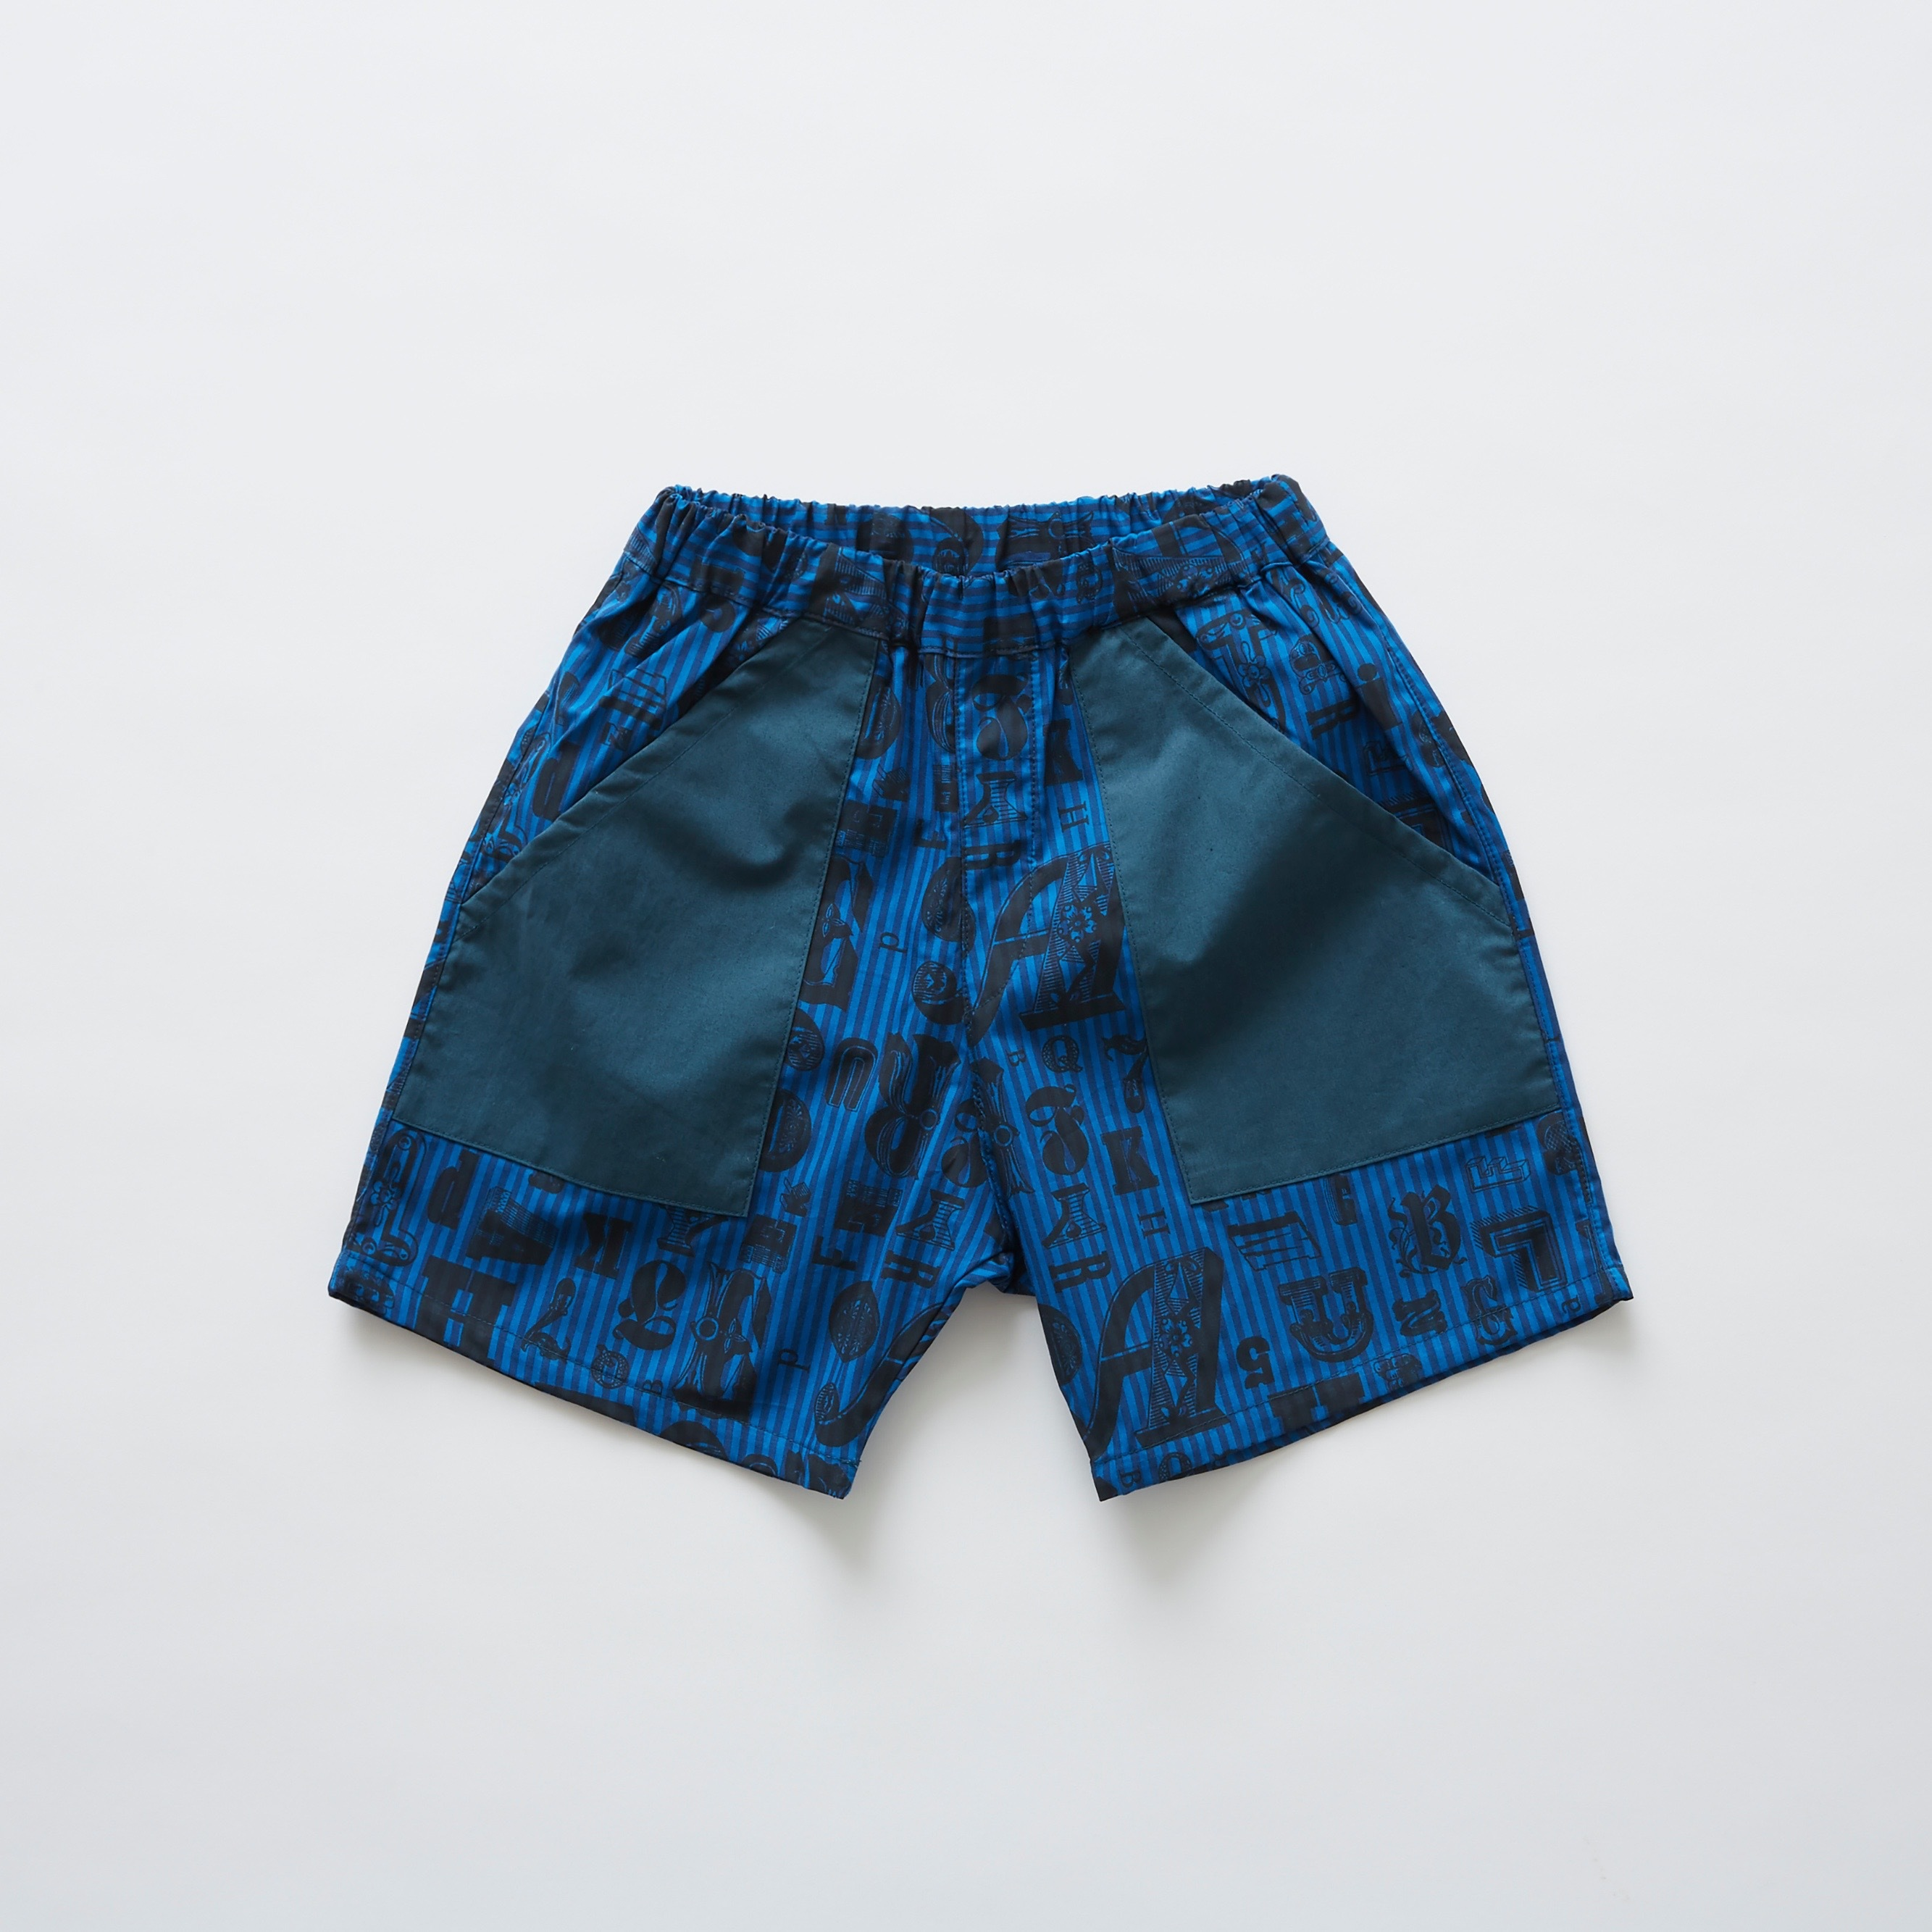 《eLfinFolk 2019SS》stripe × alphabetic print shorts / blue / 80-100cm